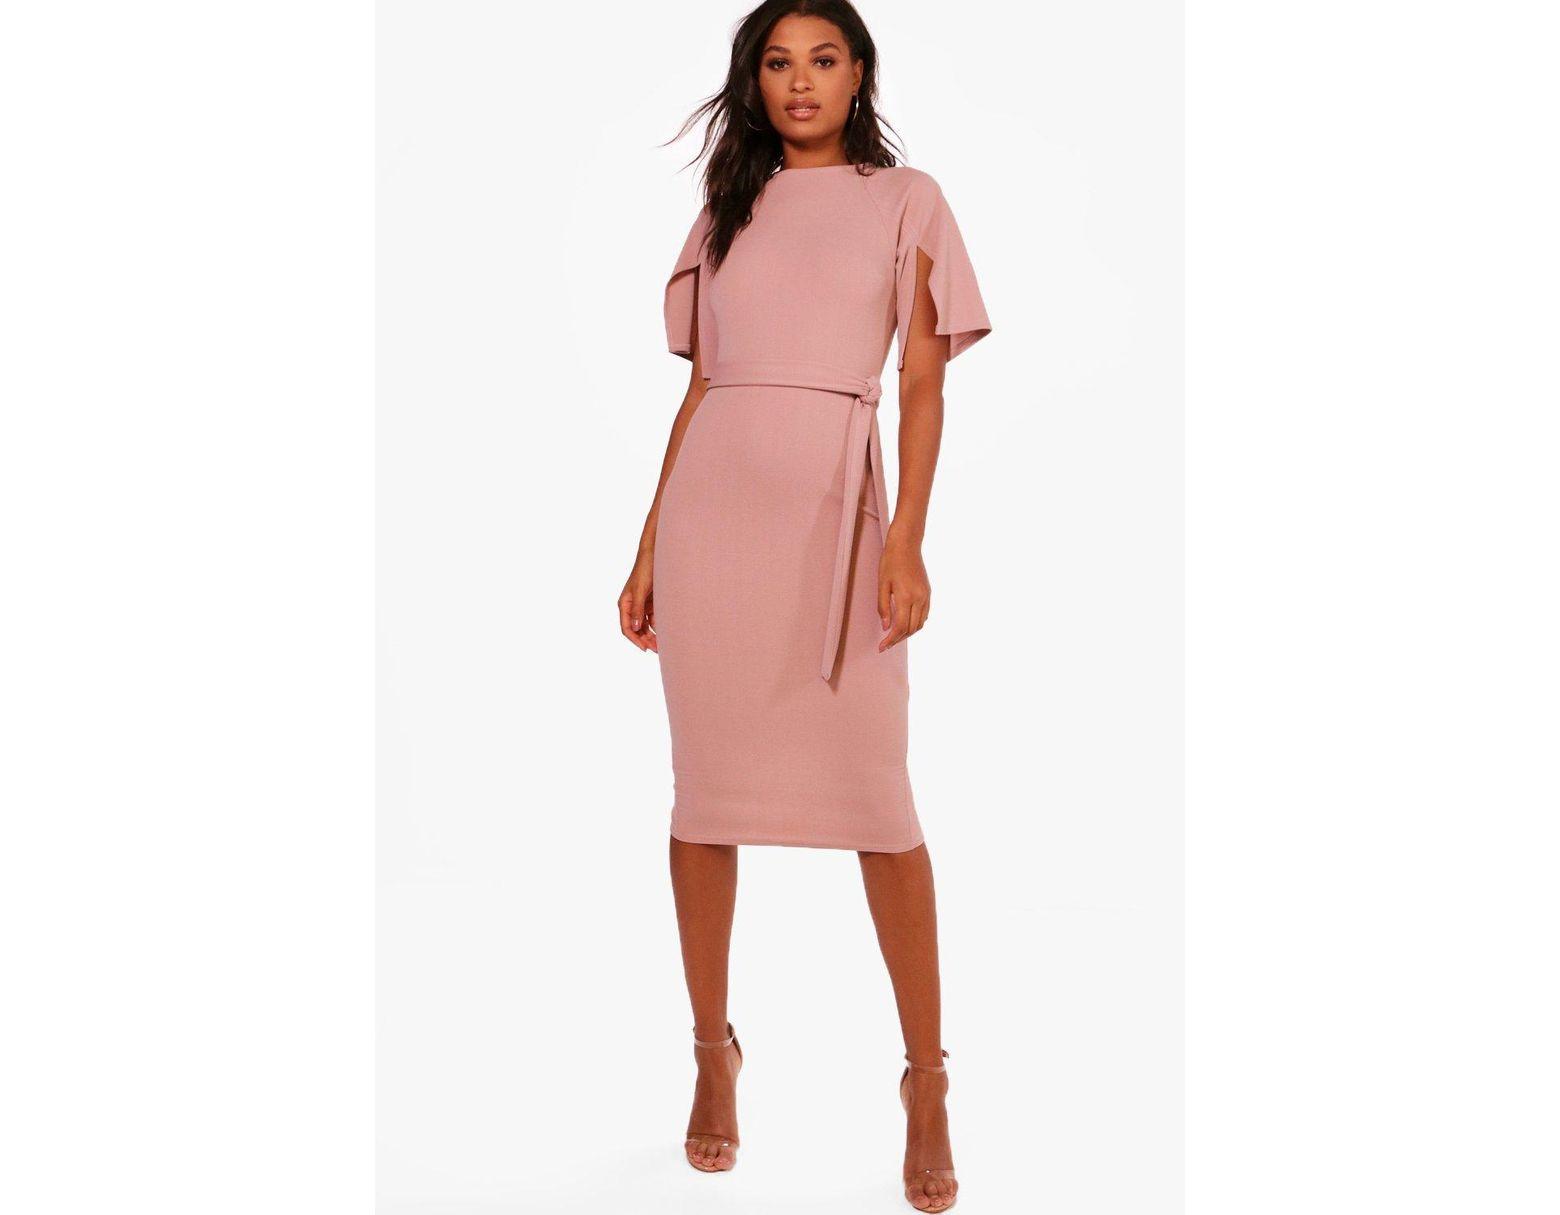 cabf16e2d4 Boohoo Split Sleeve Tie Waist Wiggle Midi Dress in Pink - Lyst